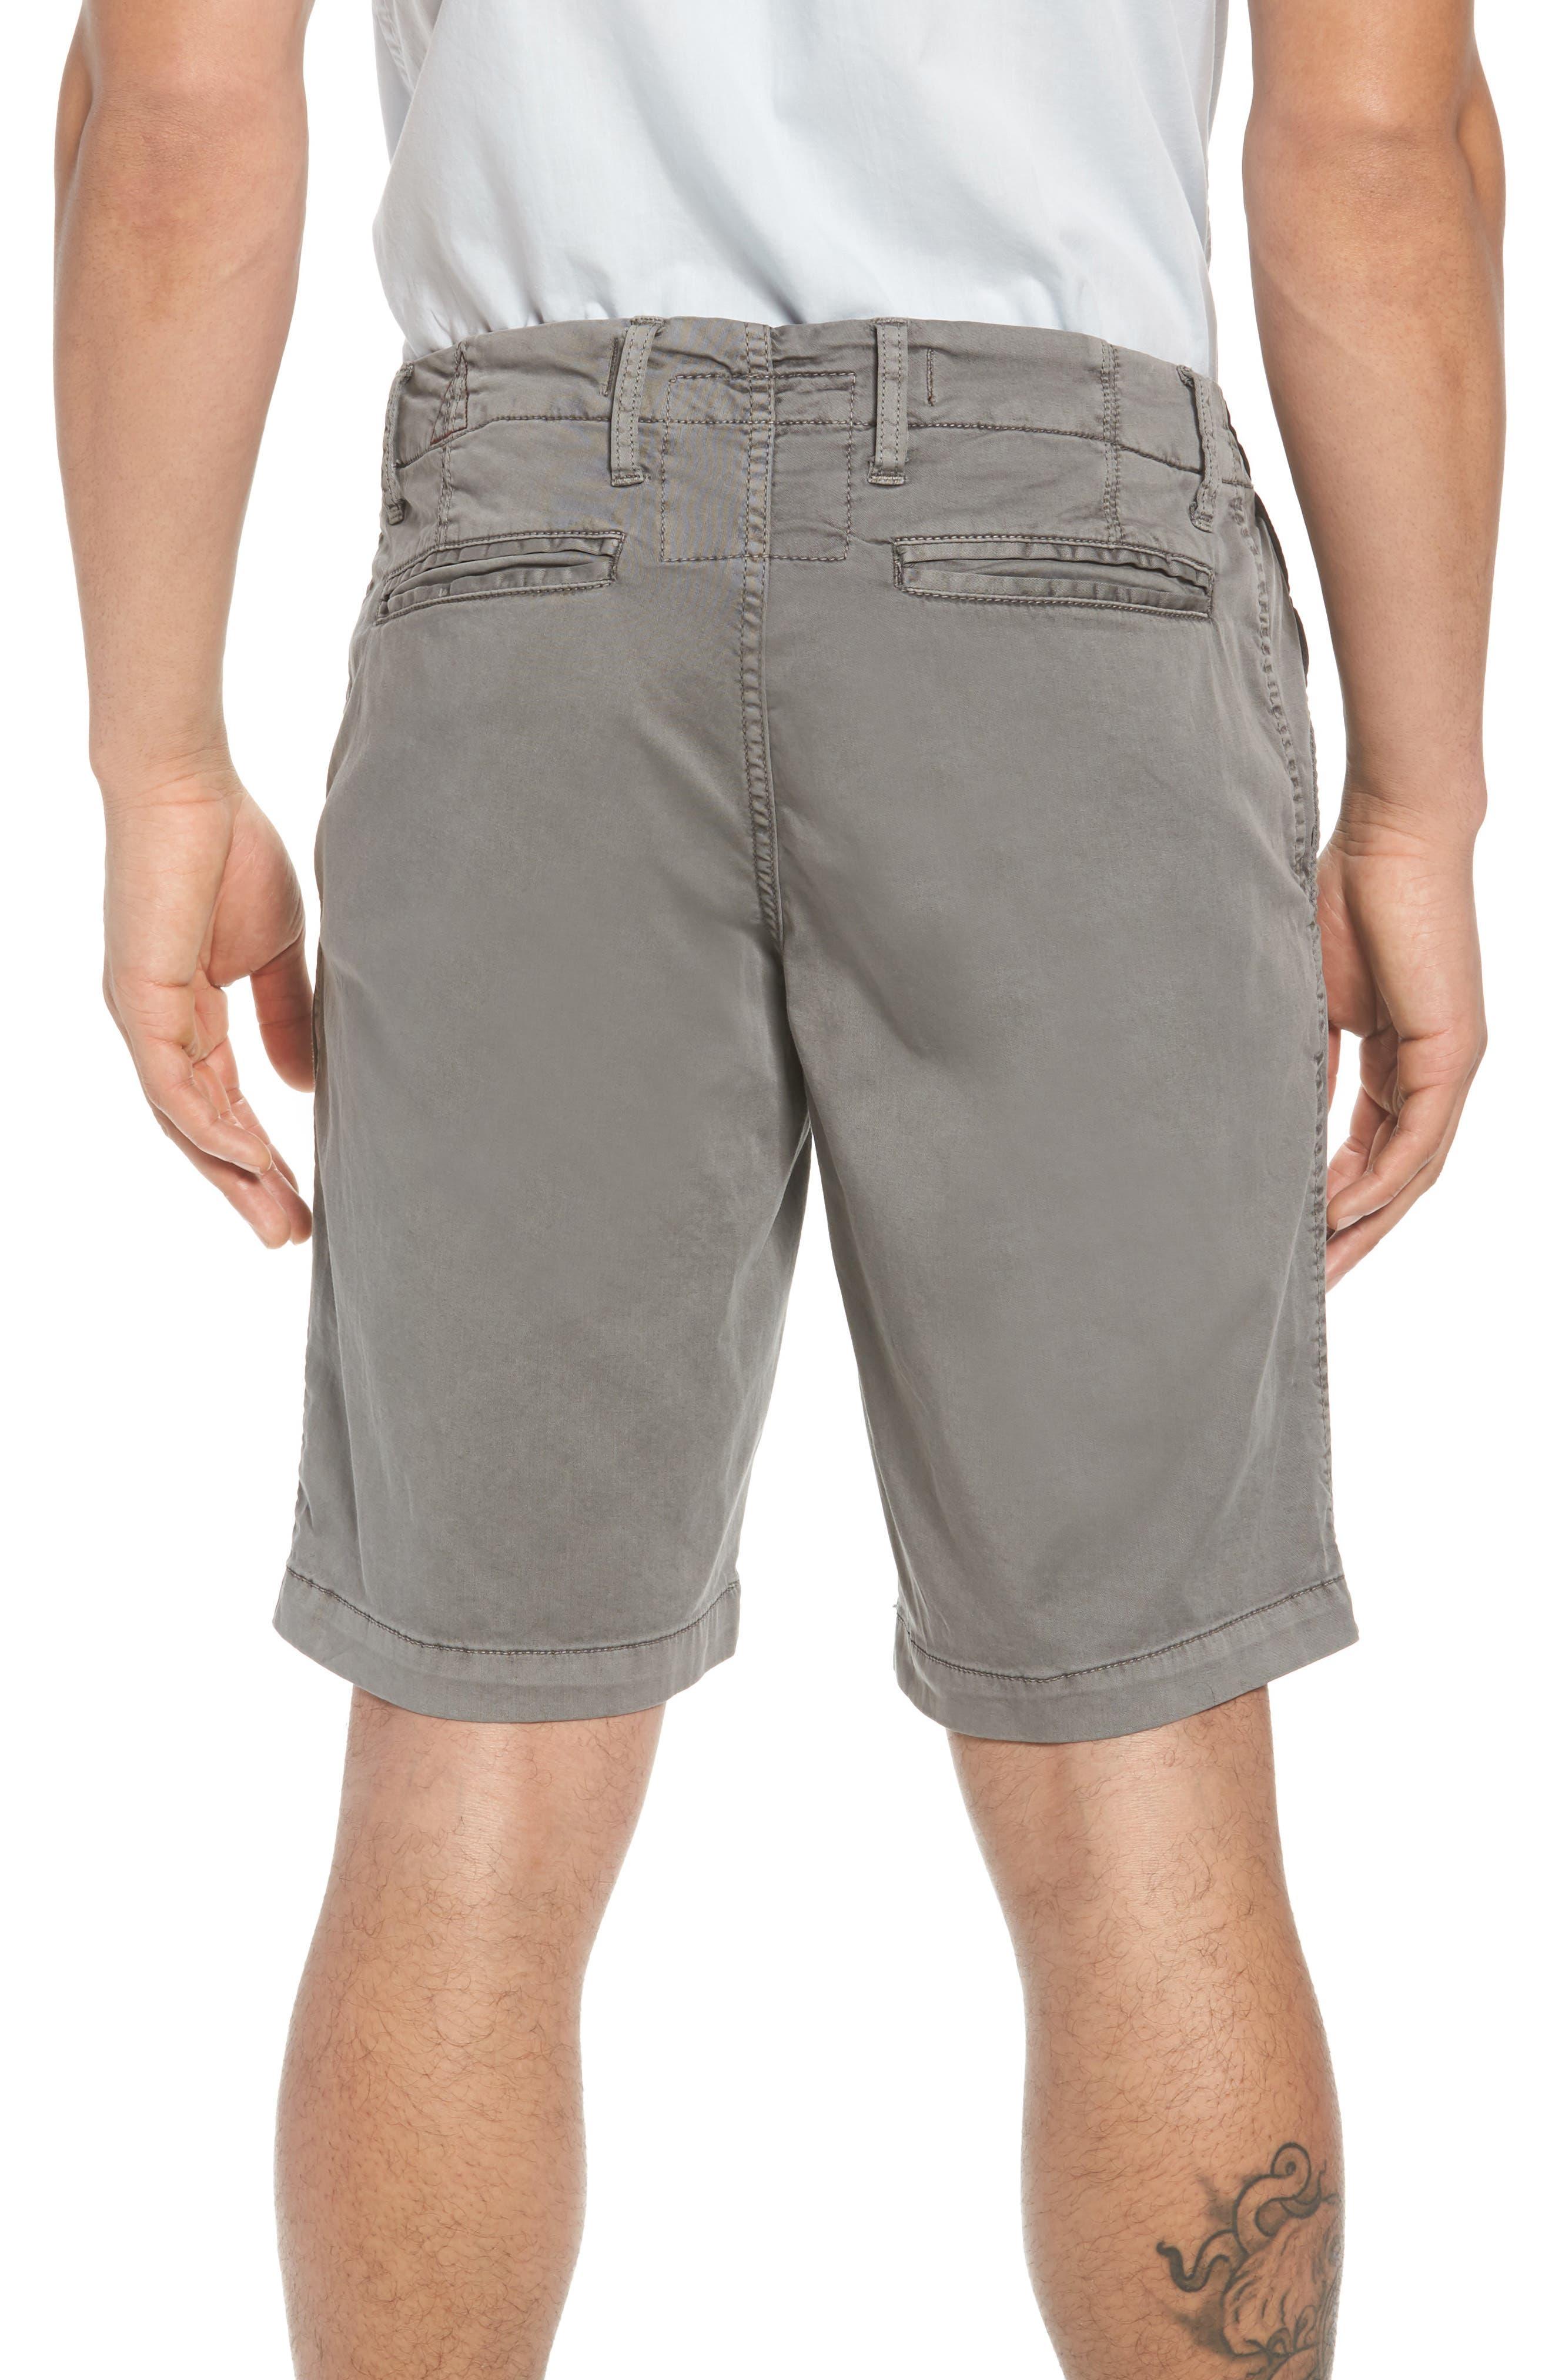 St. Barts Twill Shorts,                             Alternate thumbnail 16, color,